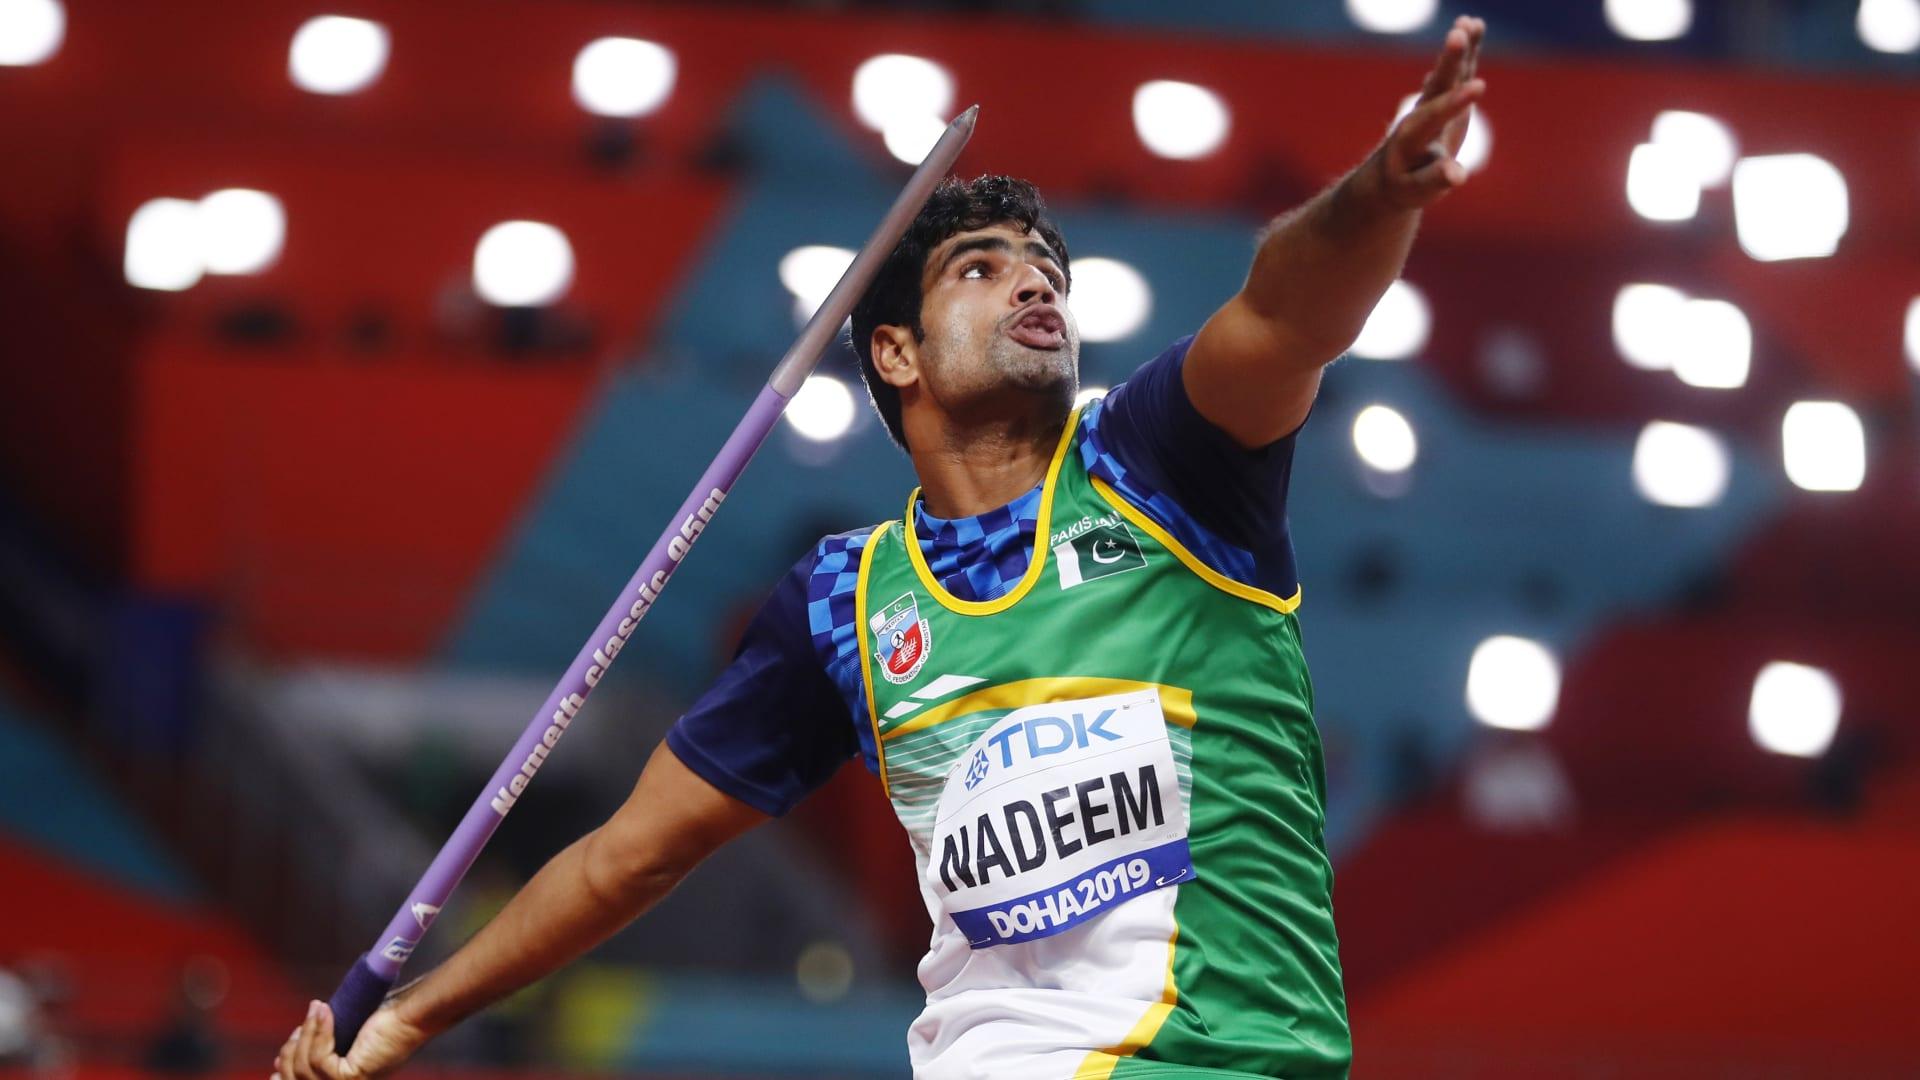 Arshad Nadeem to lock horns with Neeraj Chopra in Javelin throw final